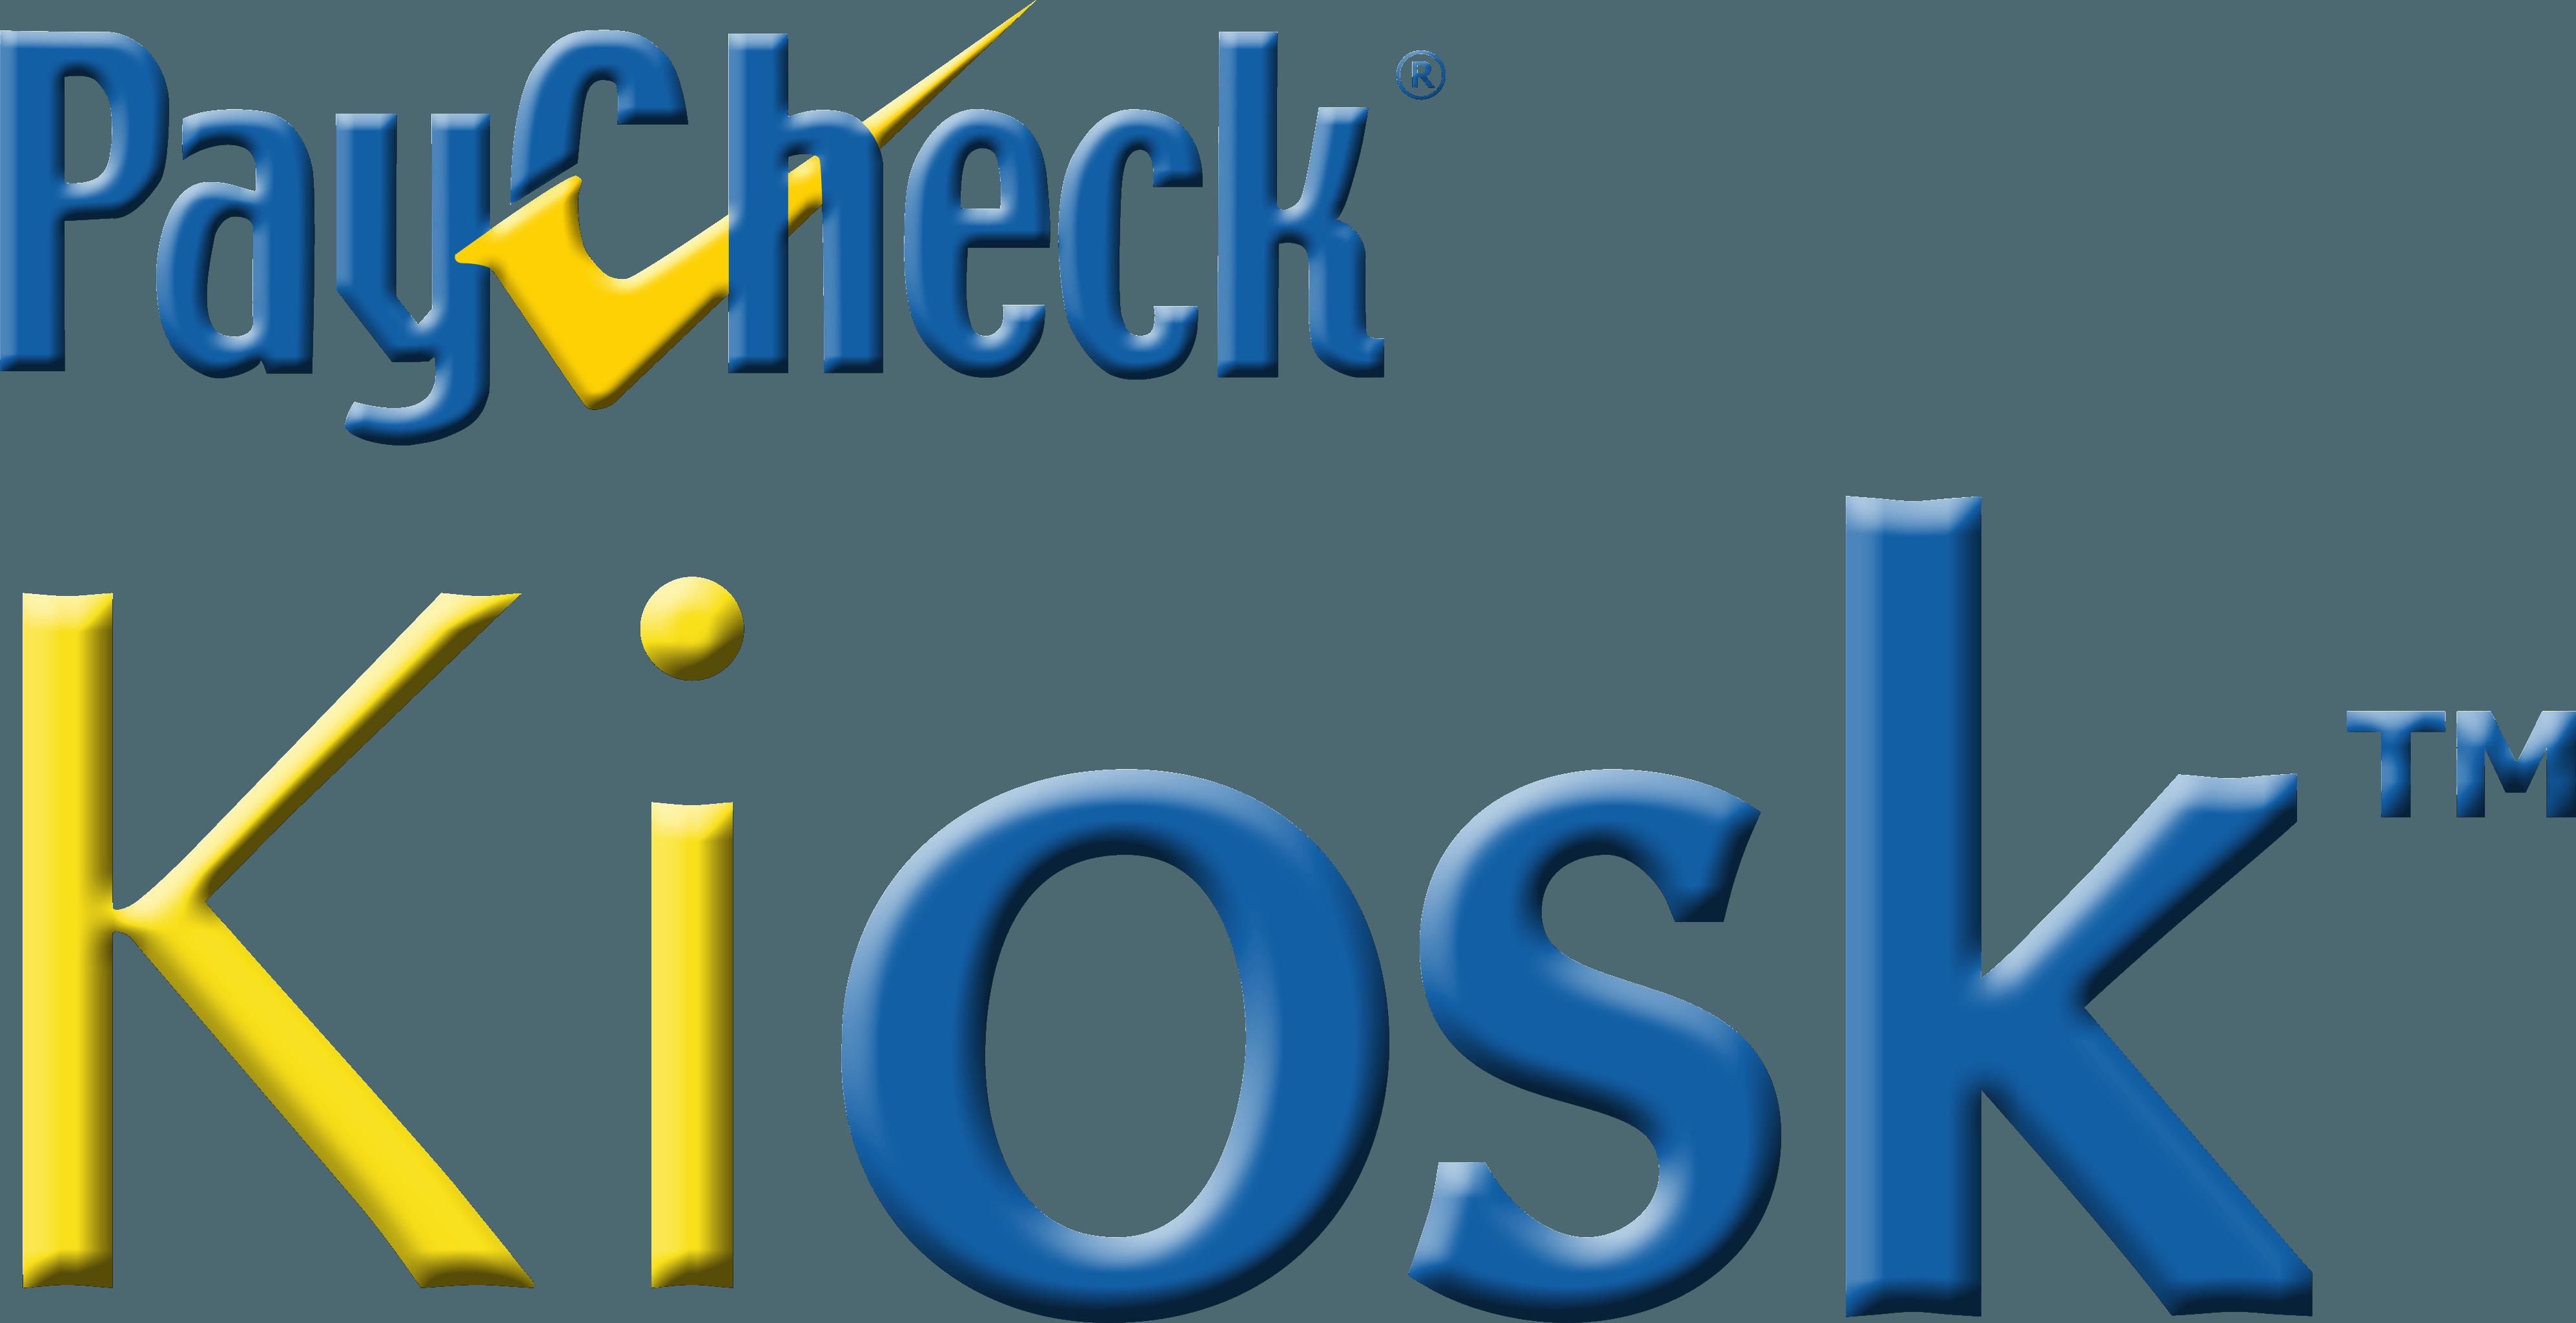 Paycheck Kiosk Logo